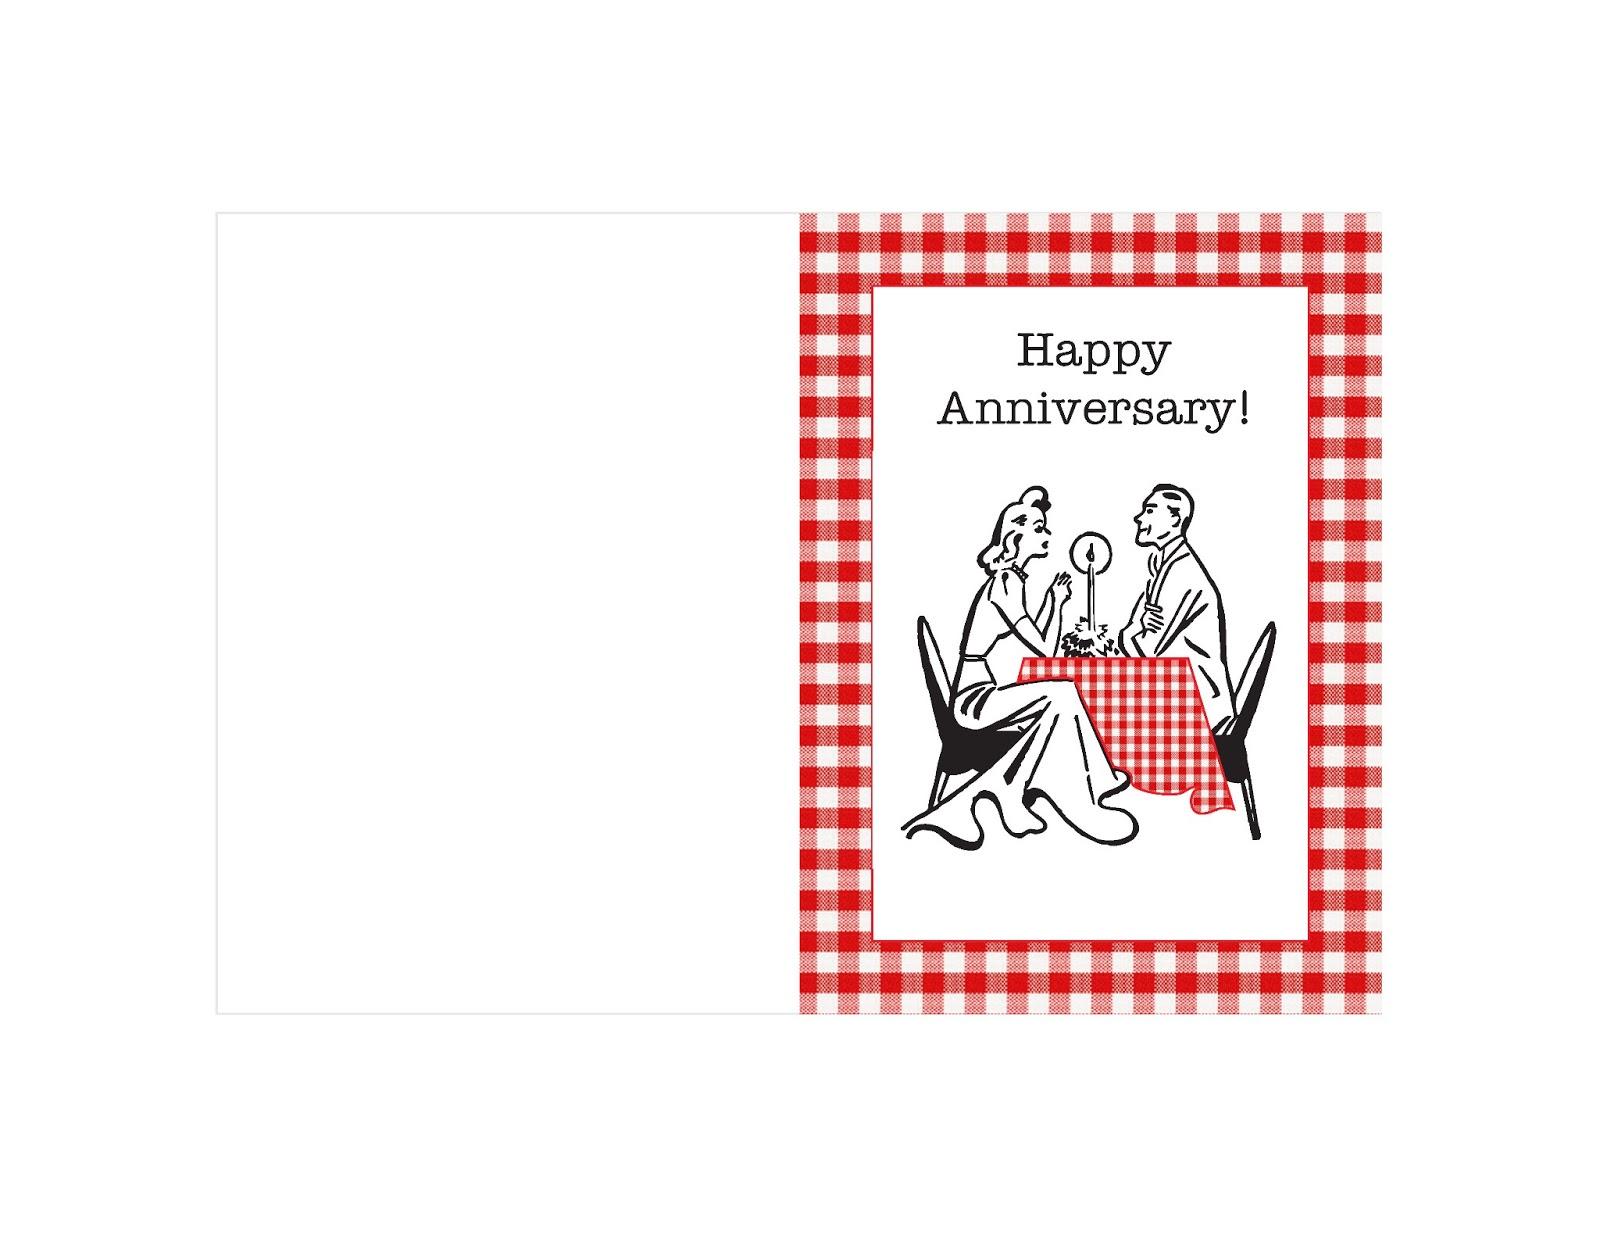 Online Printable Wedding Anniversary Cards – Printable Anniversary Cards Free Online